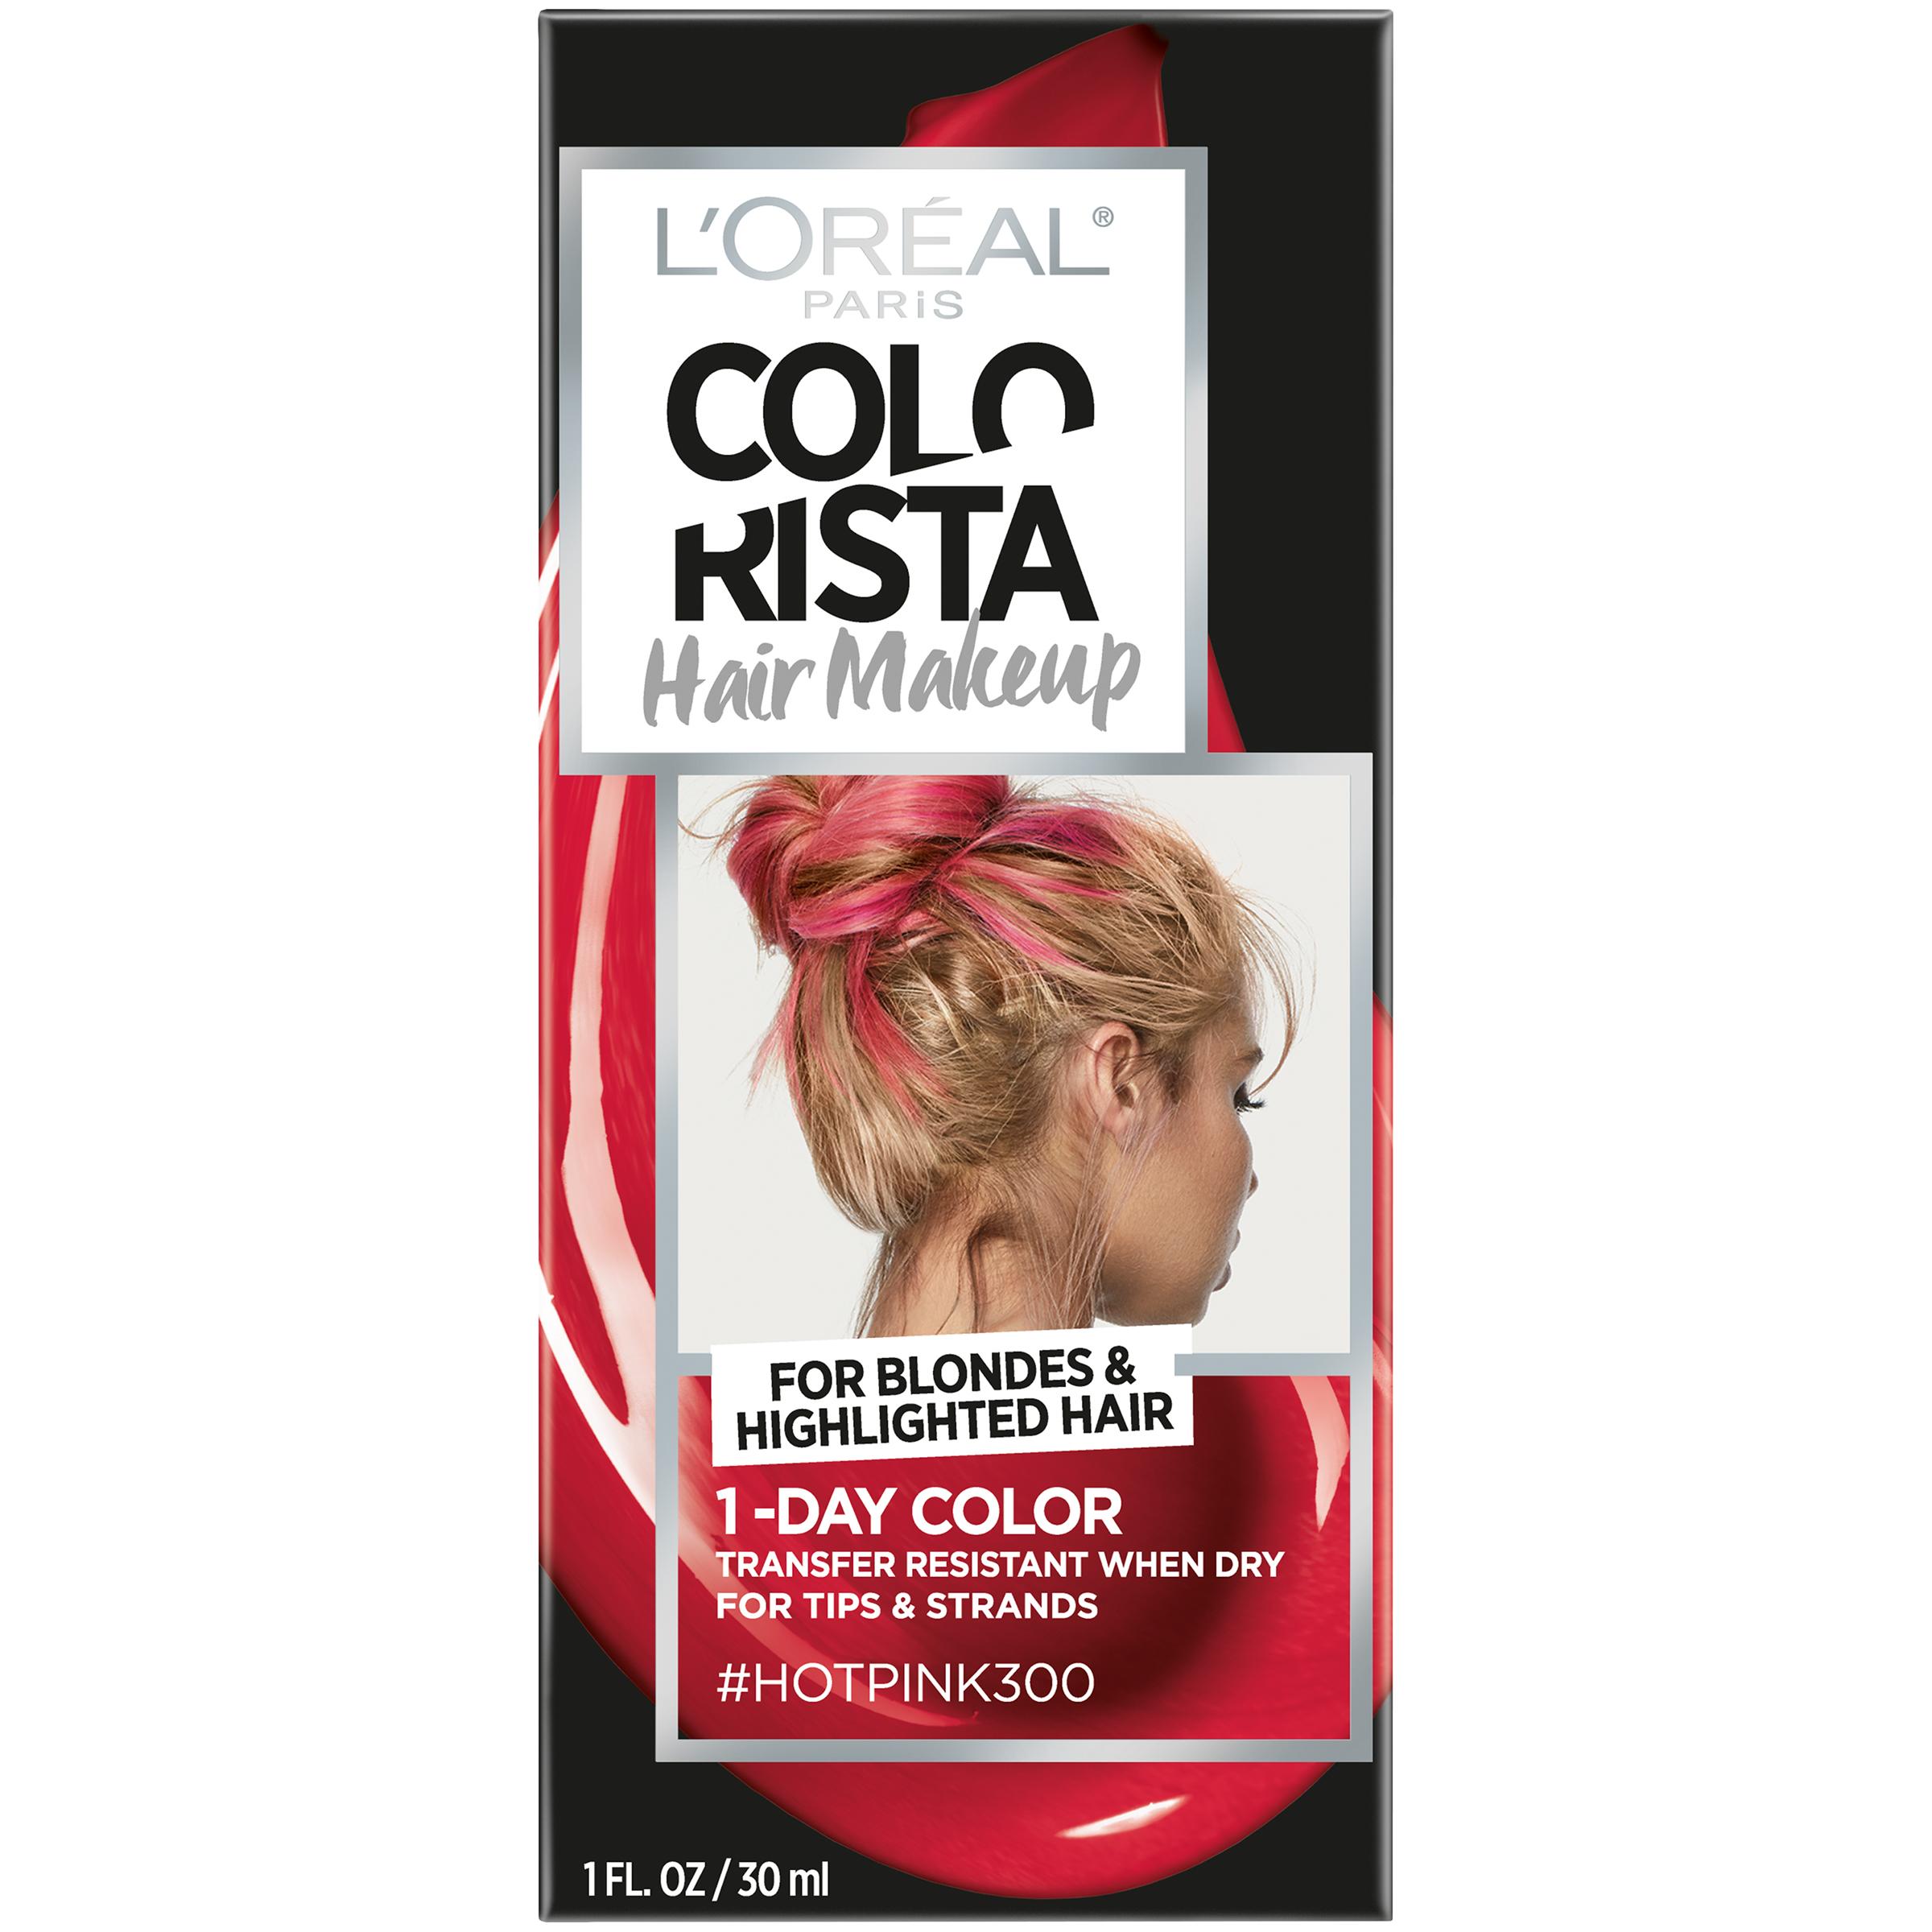 L'Oreal Paris Colorista Hair Makeup 1-Day Hair Color, Green70 (for brunettes), 1 fl. oz.